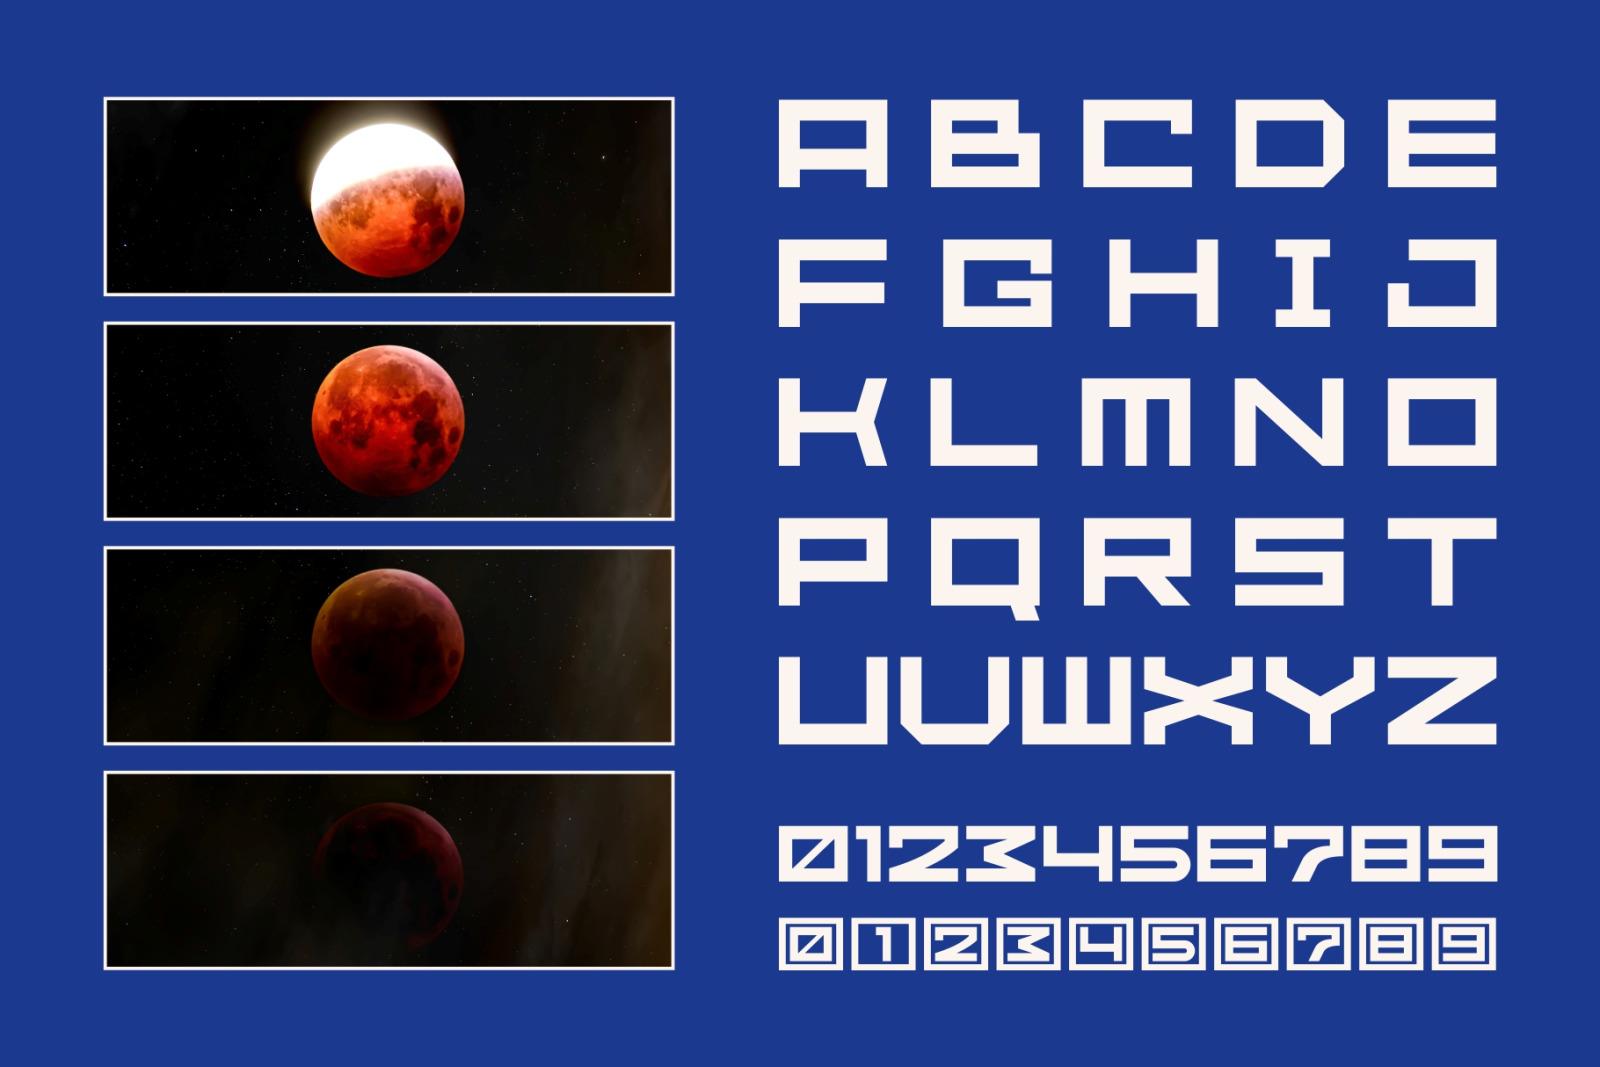 GR Fatient - Modern Cubical Typeface